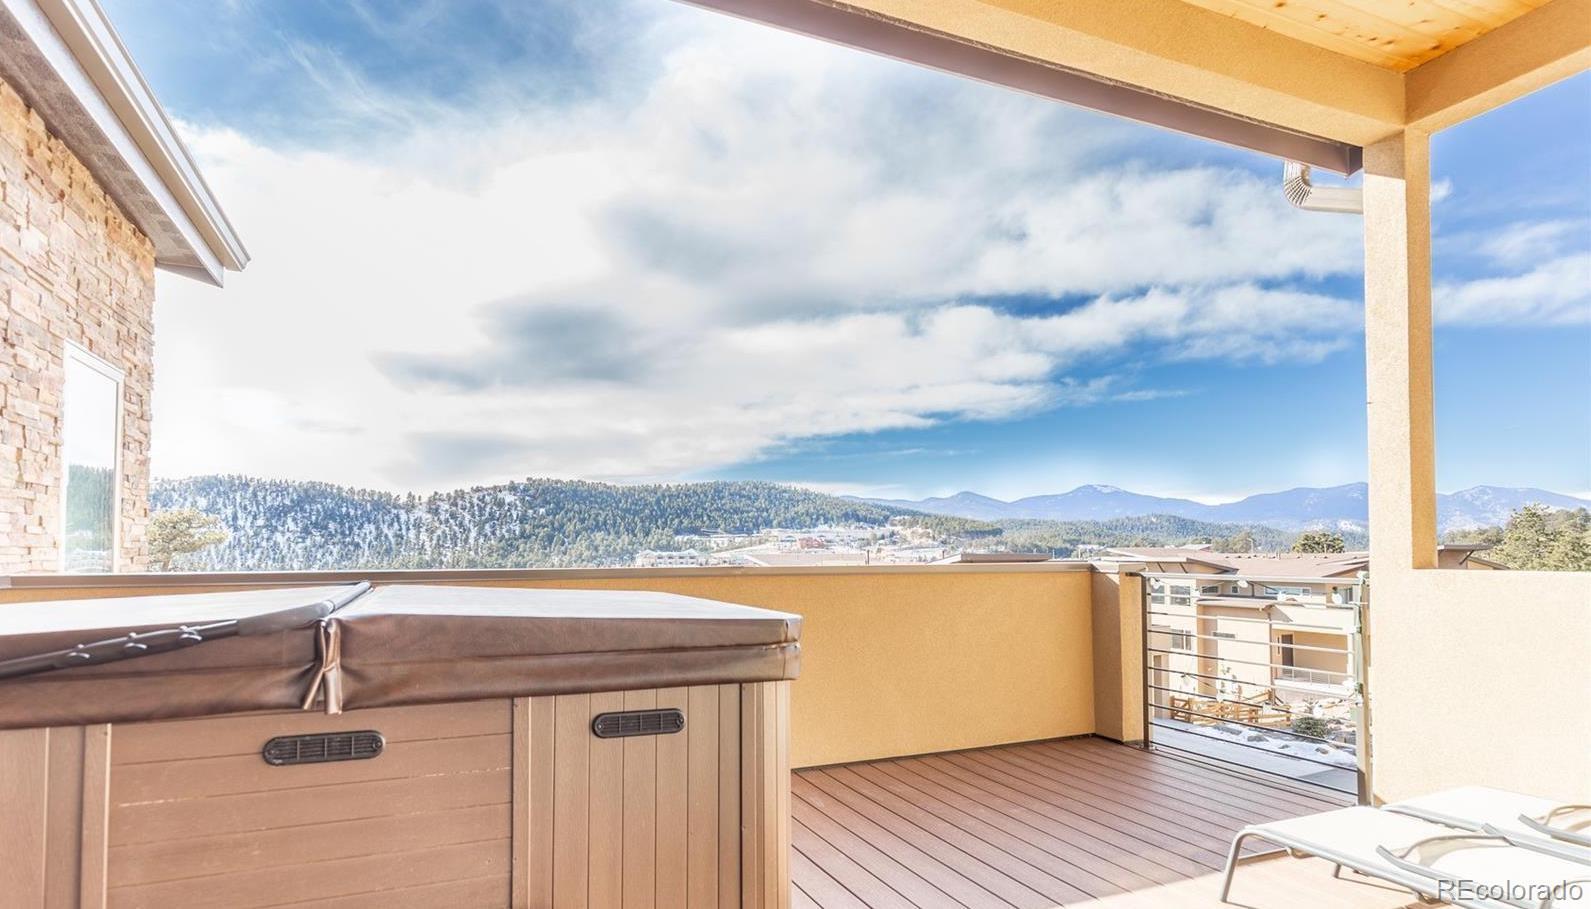 756 Dreamcatcher Lane, Evergreen, CO 80439 - Evergreen, CO real estate listing